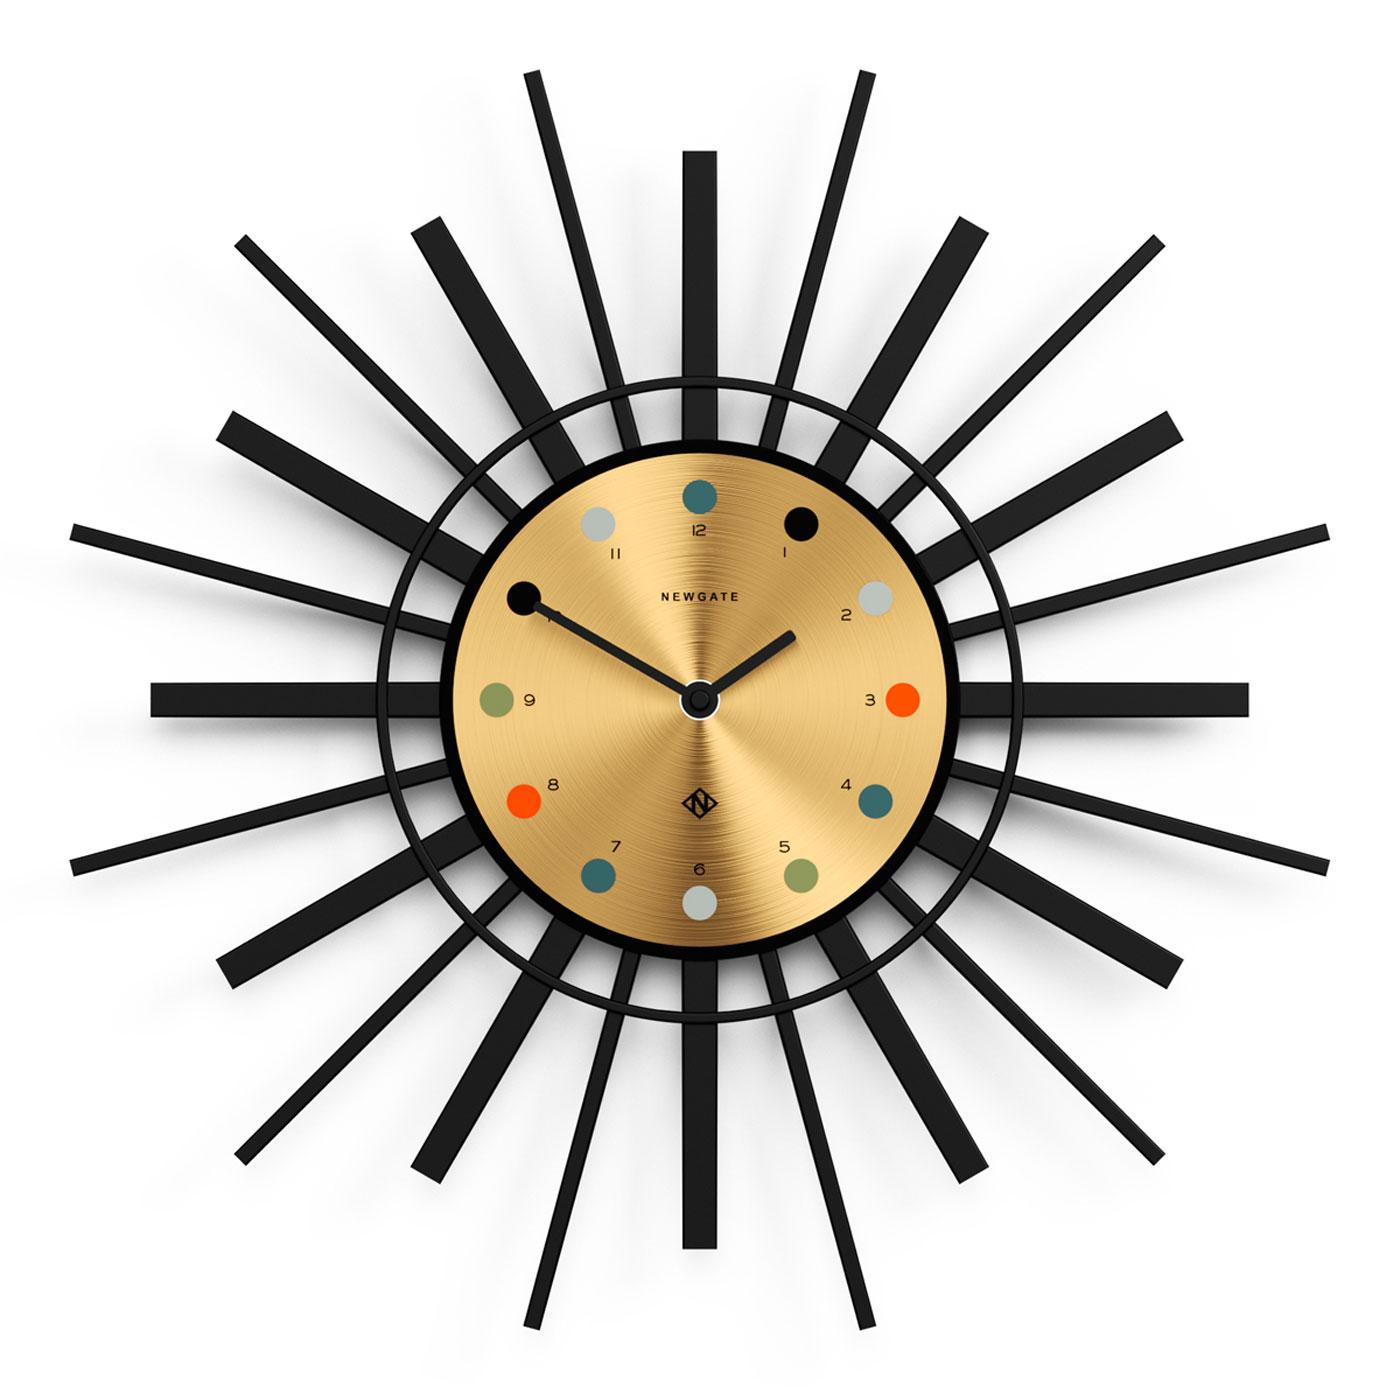 Stingray NEWGATE CLOCKS Retro Atomic Wall Clock G